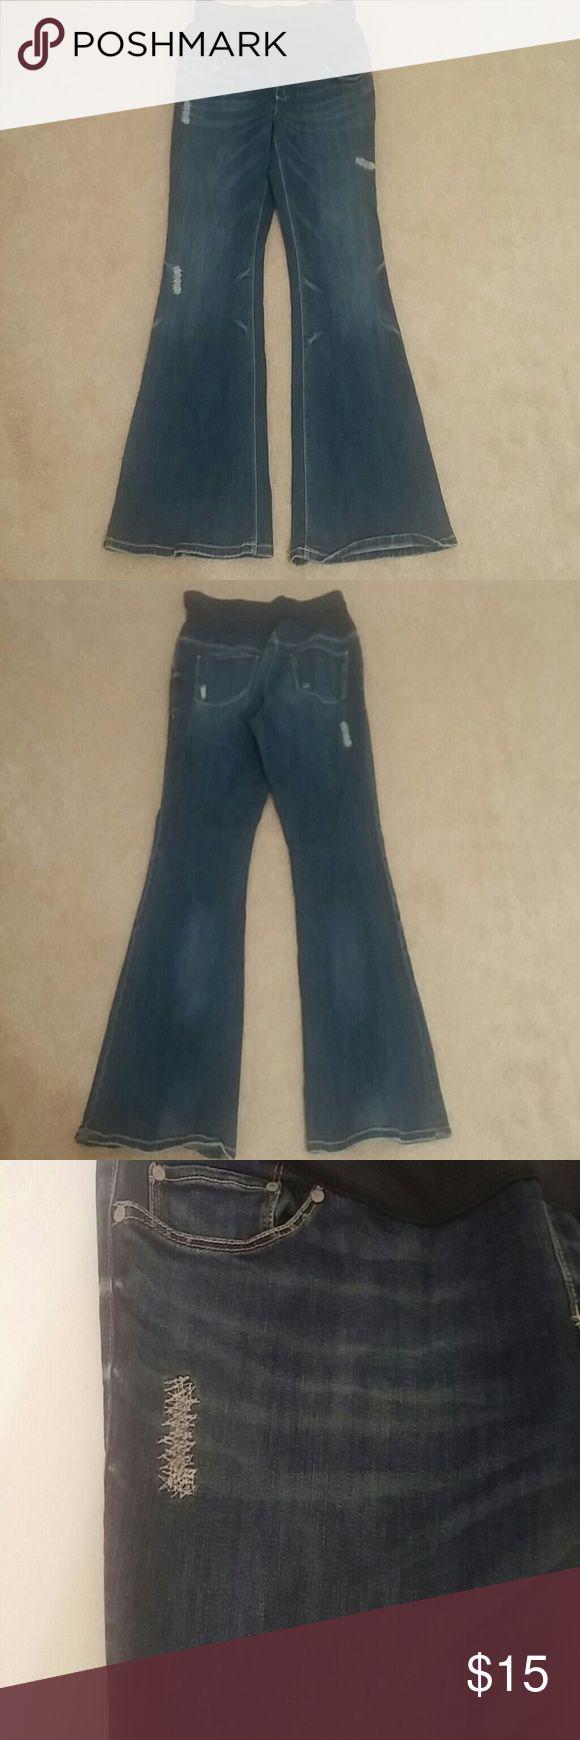 Old navy maternity jeans Size 8 old navy maternity jeans Old Navy Jeans Flare & Wide Leg